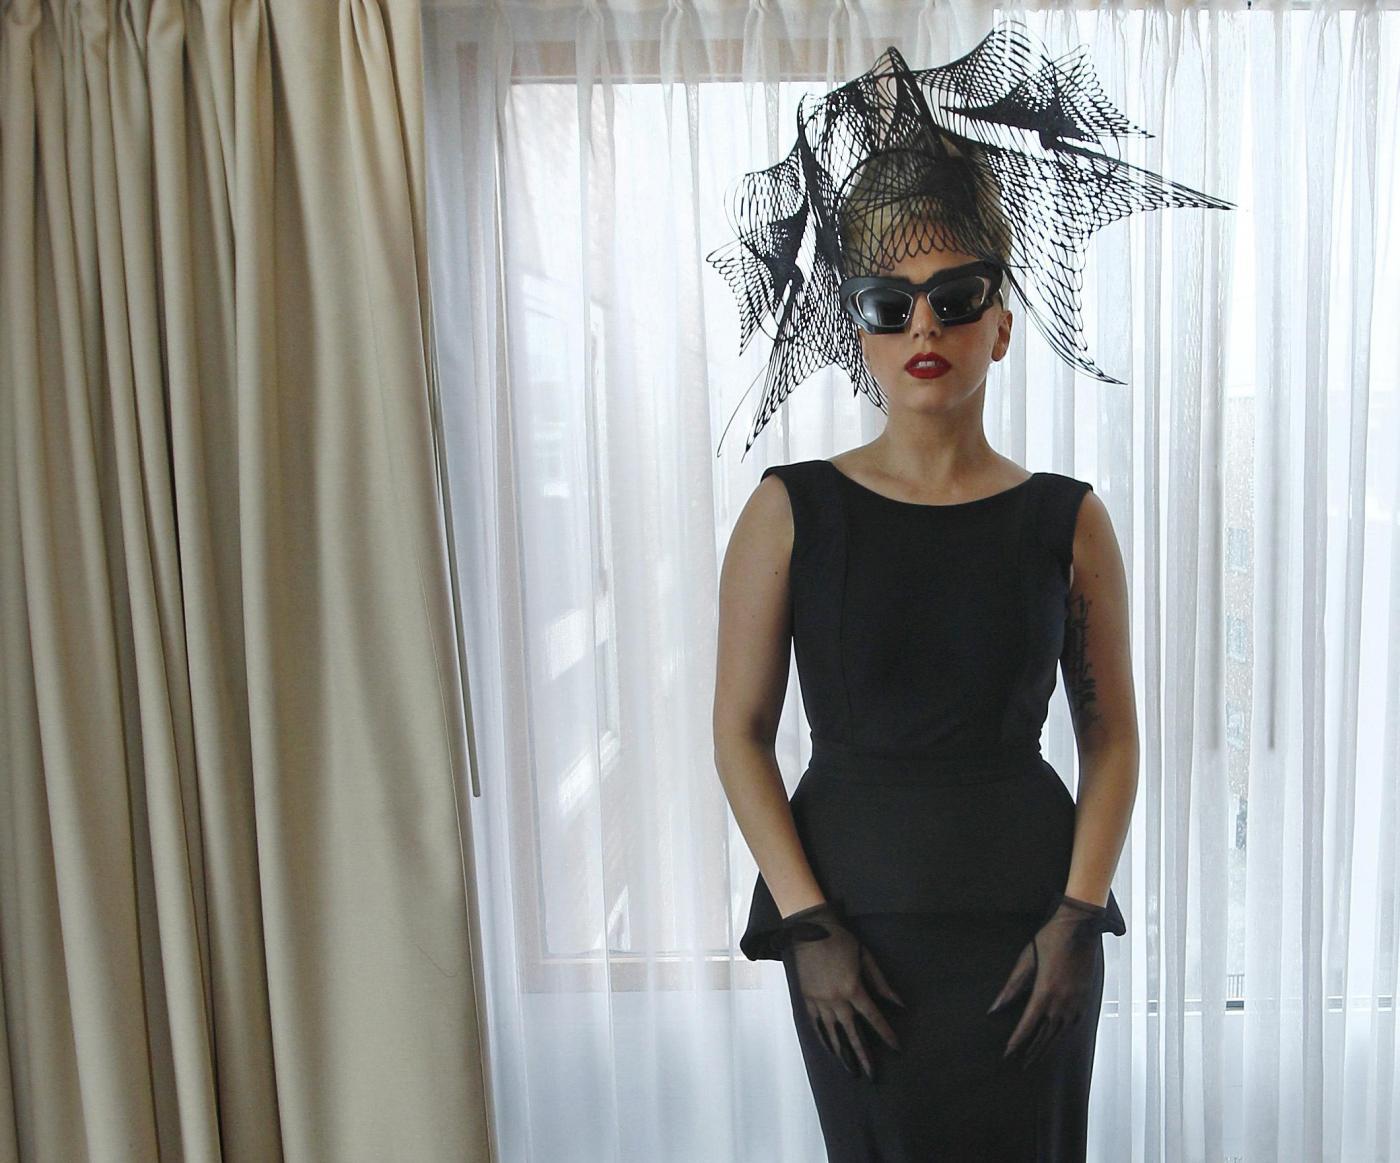 Lady Gaga obbliga i paparazzi a photoshopparla